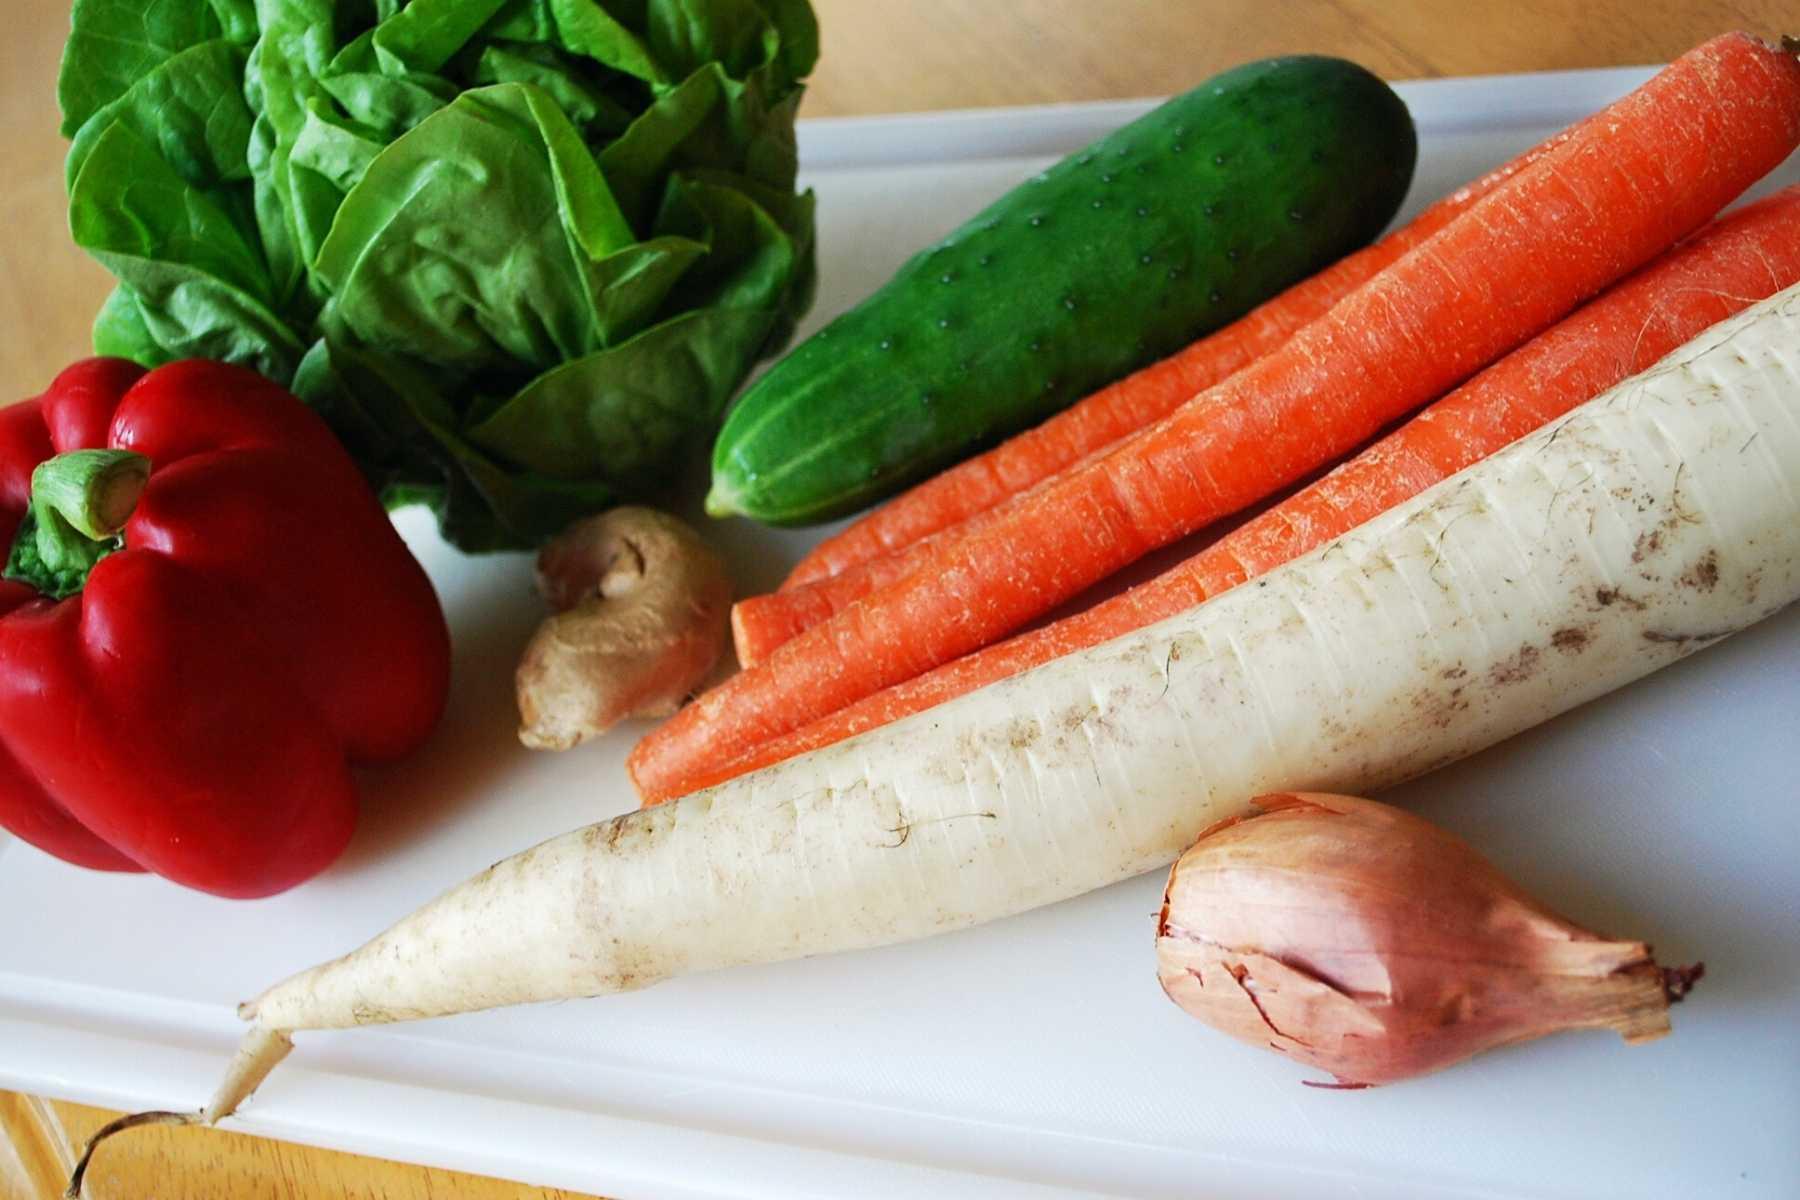 fresh vegetables for salad rolls on a cutting board